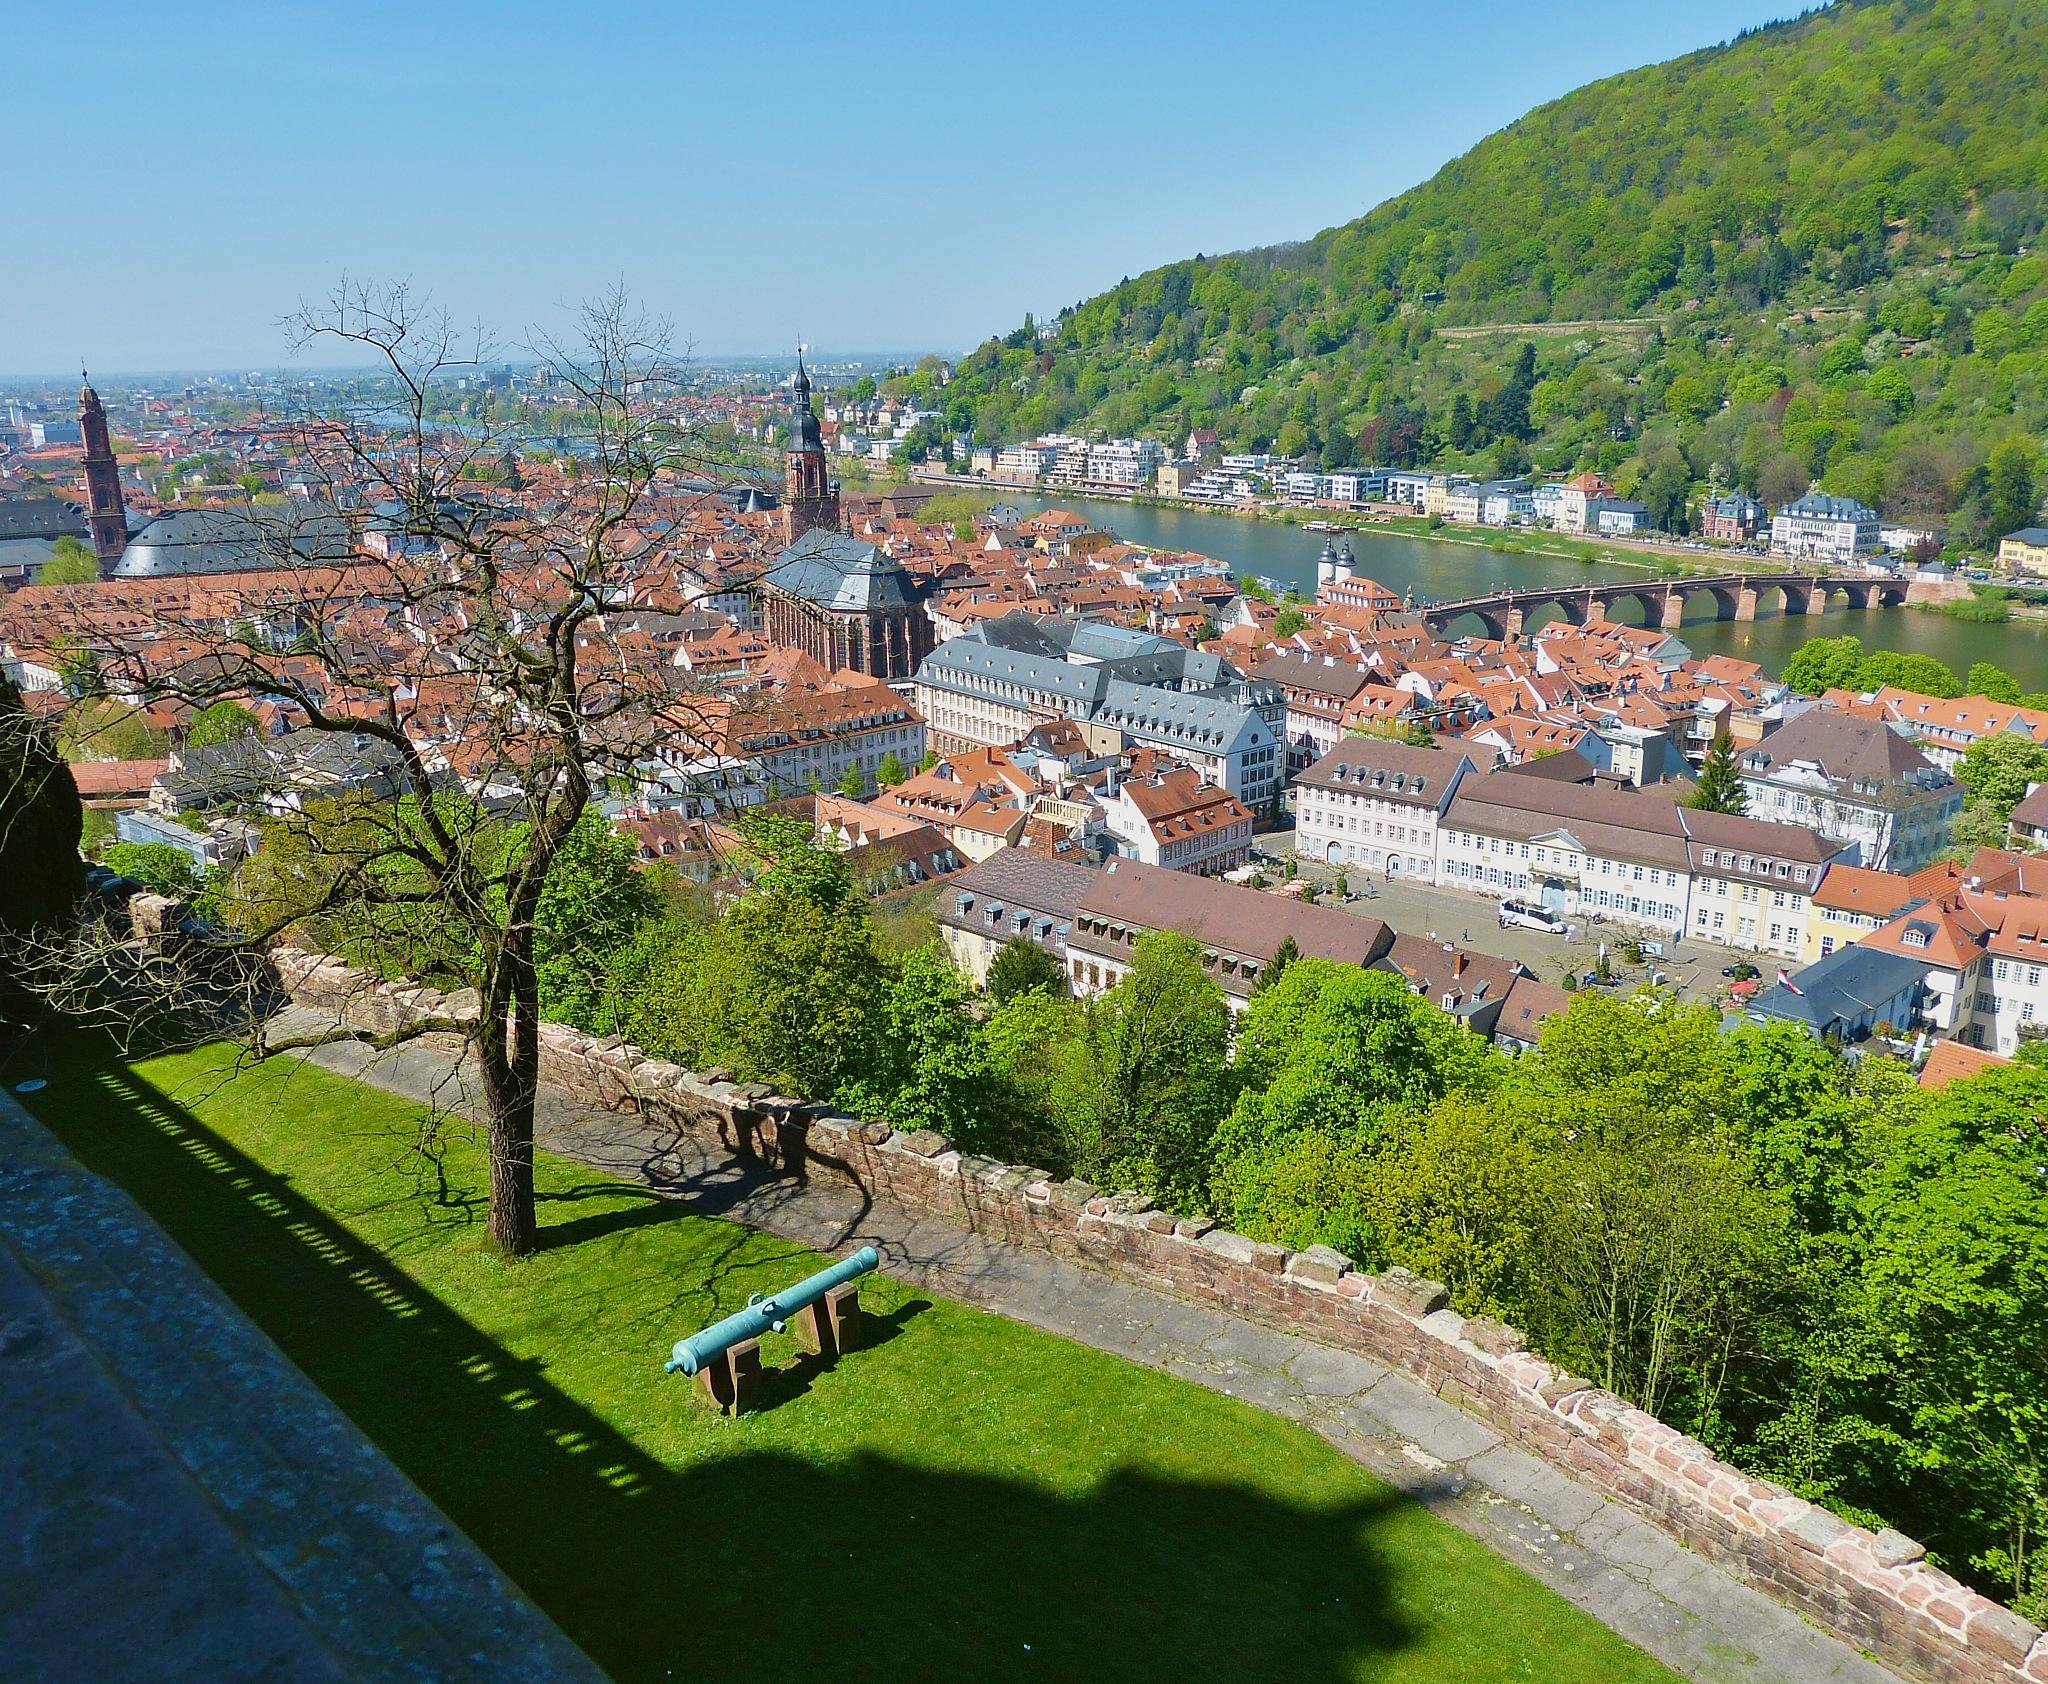 Heidelberg, Germany by Christoph Spannagel